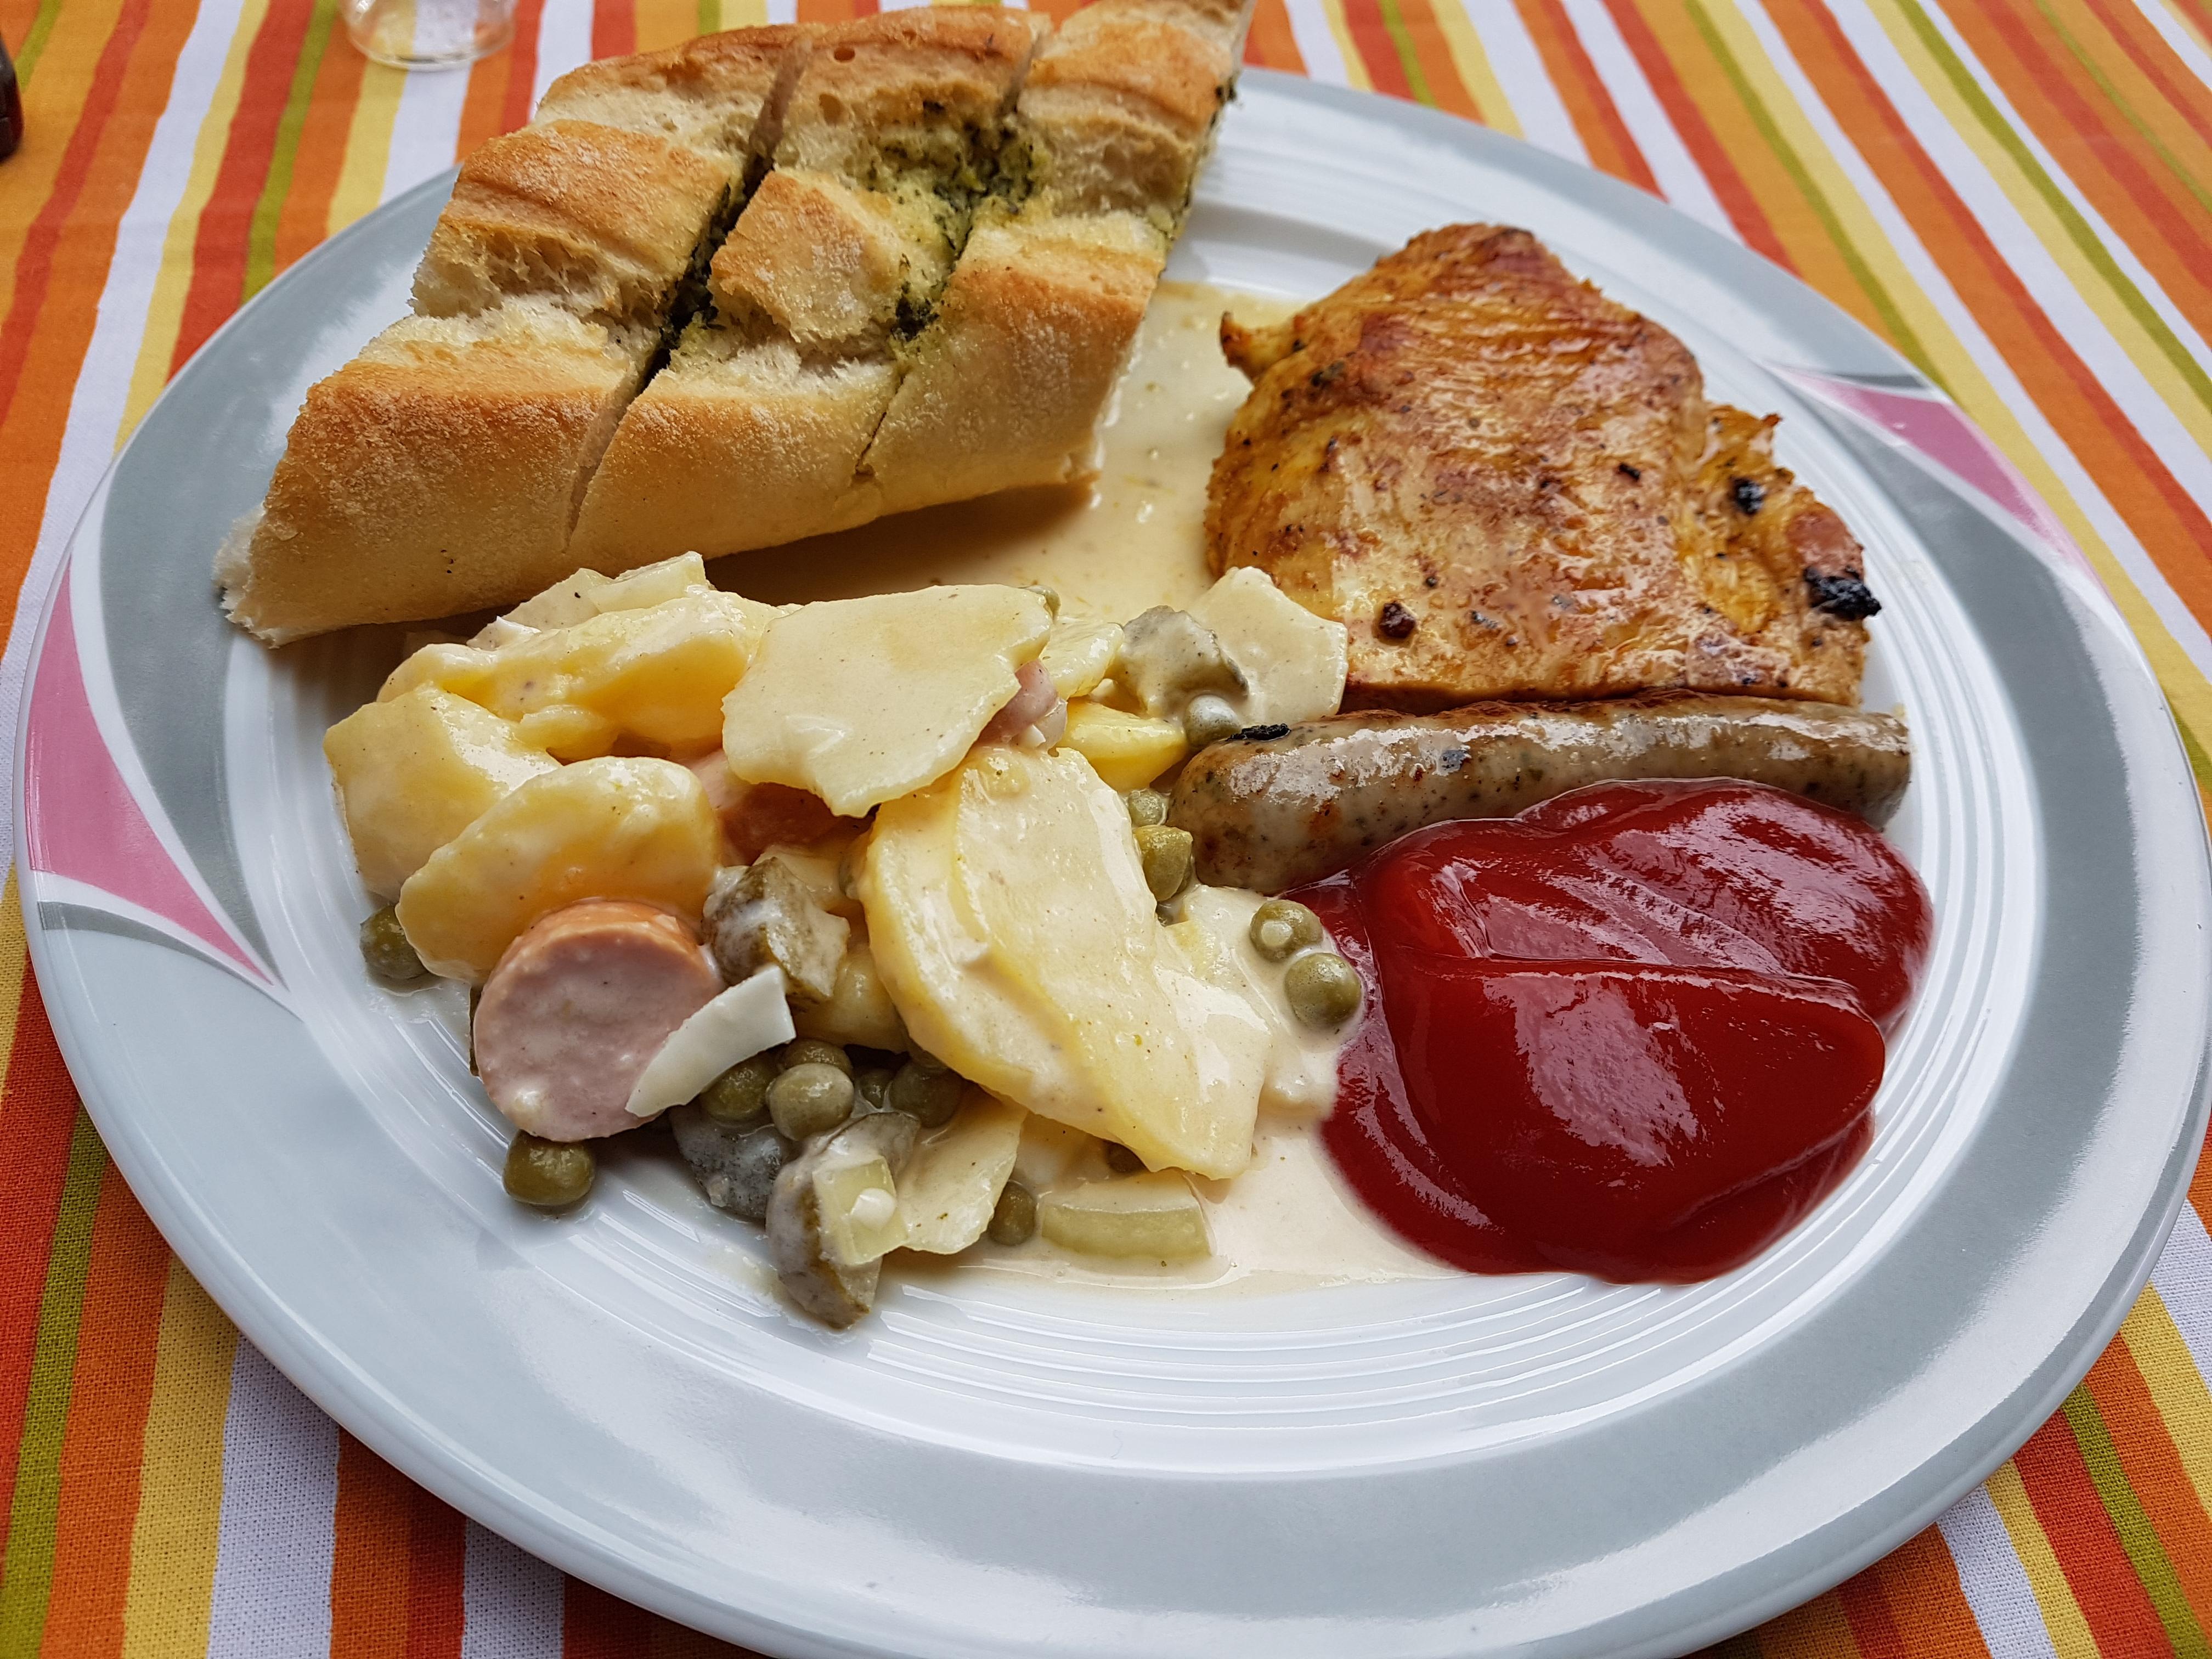 http://foodloader.net/Holz_2017-06-25_Grillgut.jpg